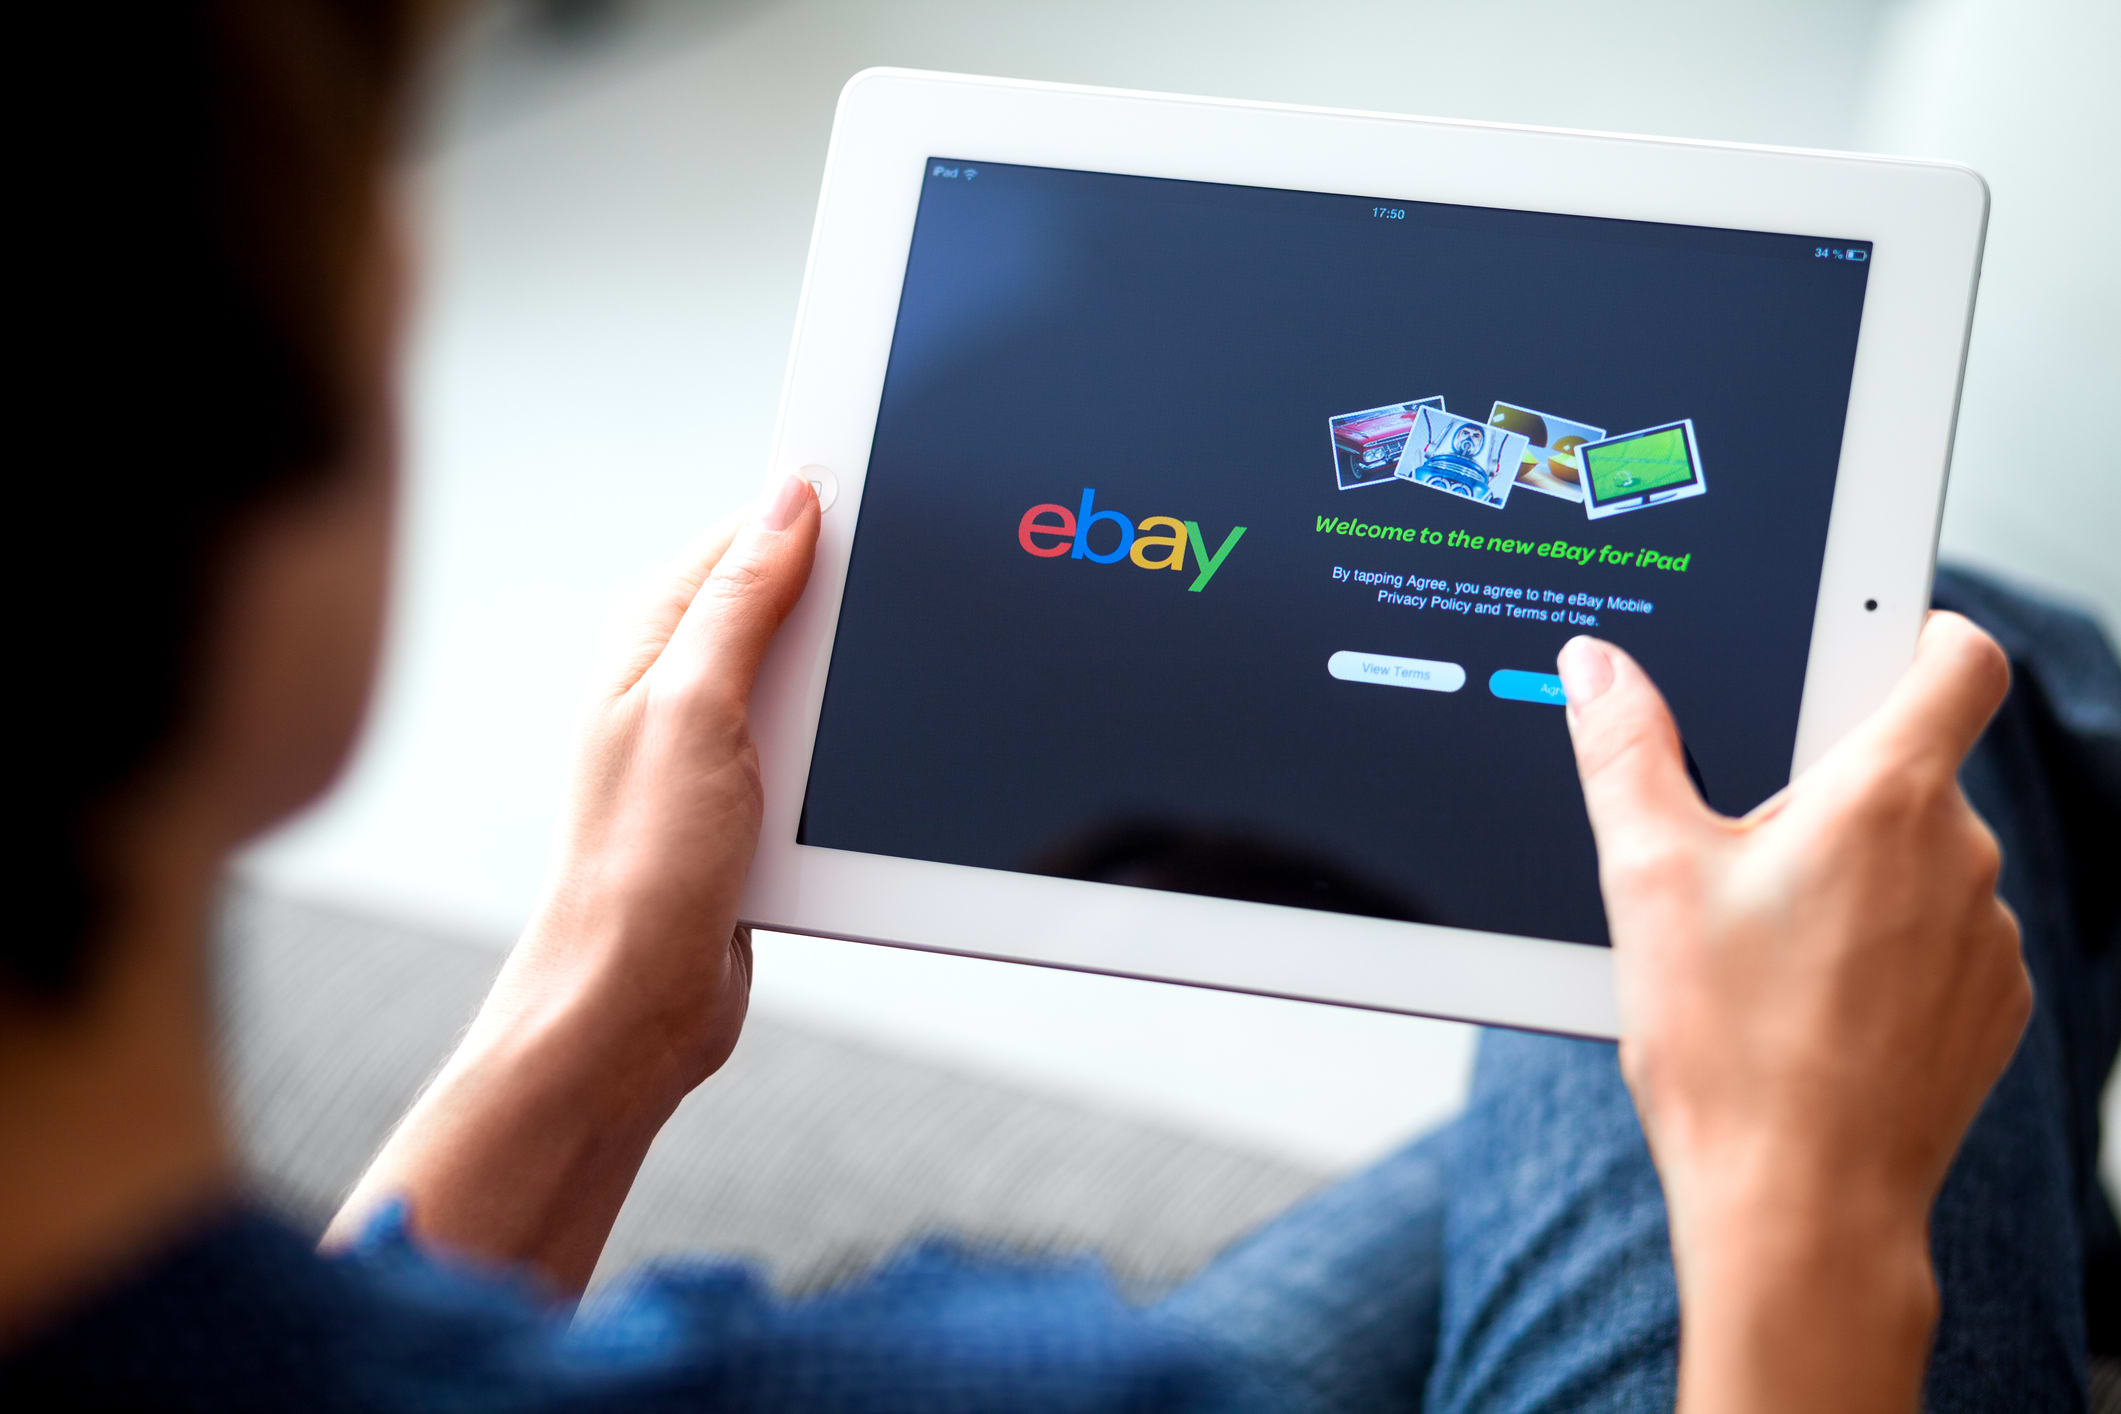 eBay on iPad